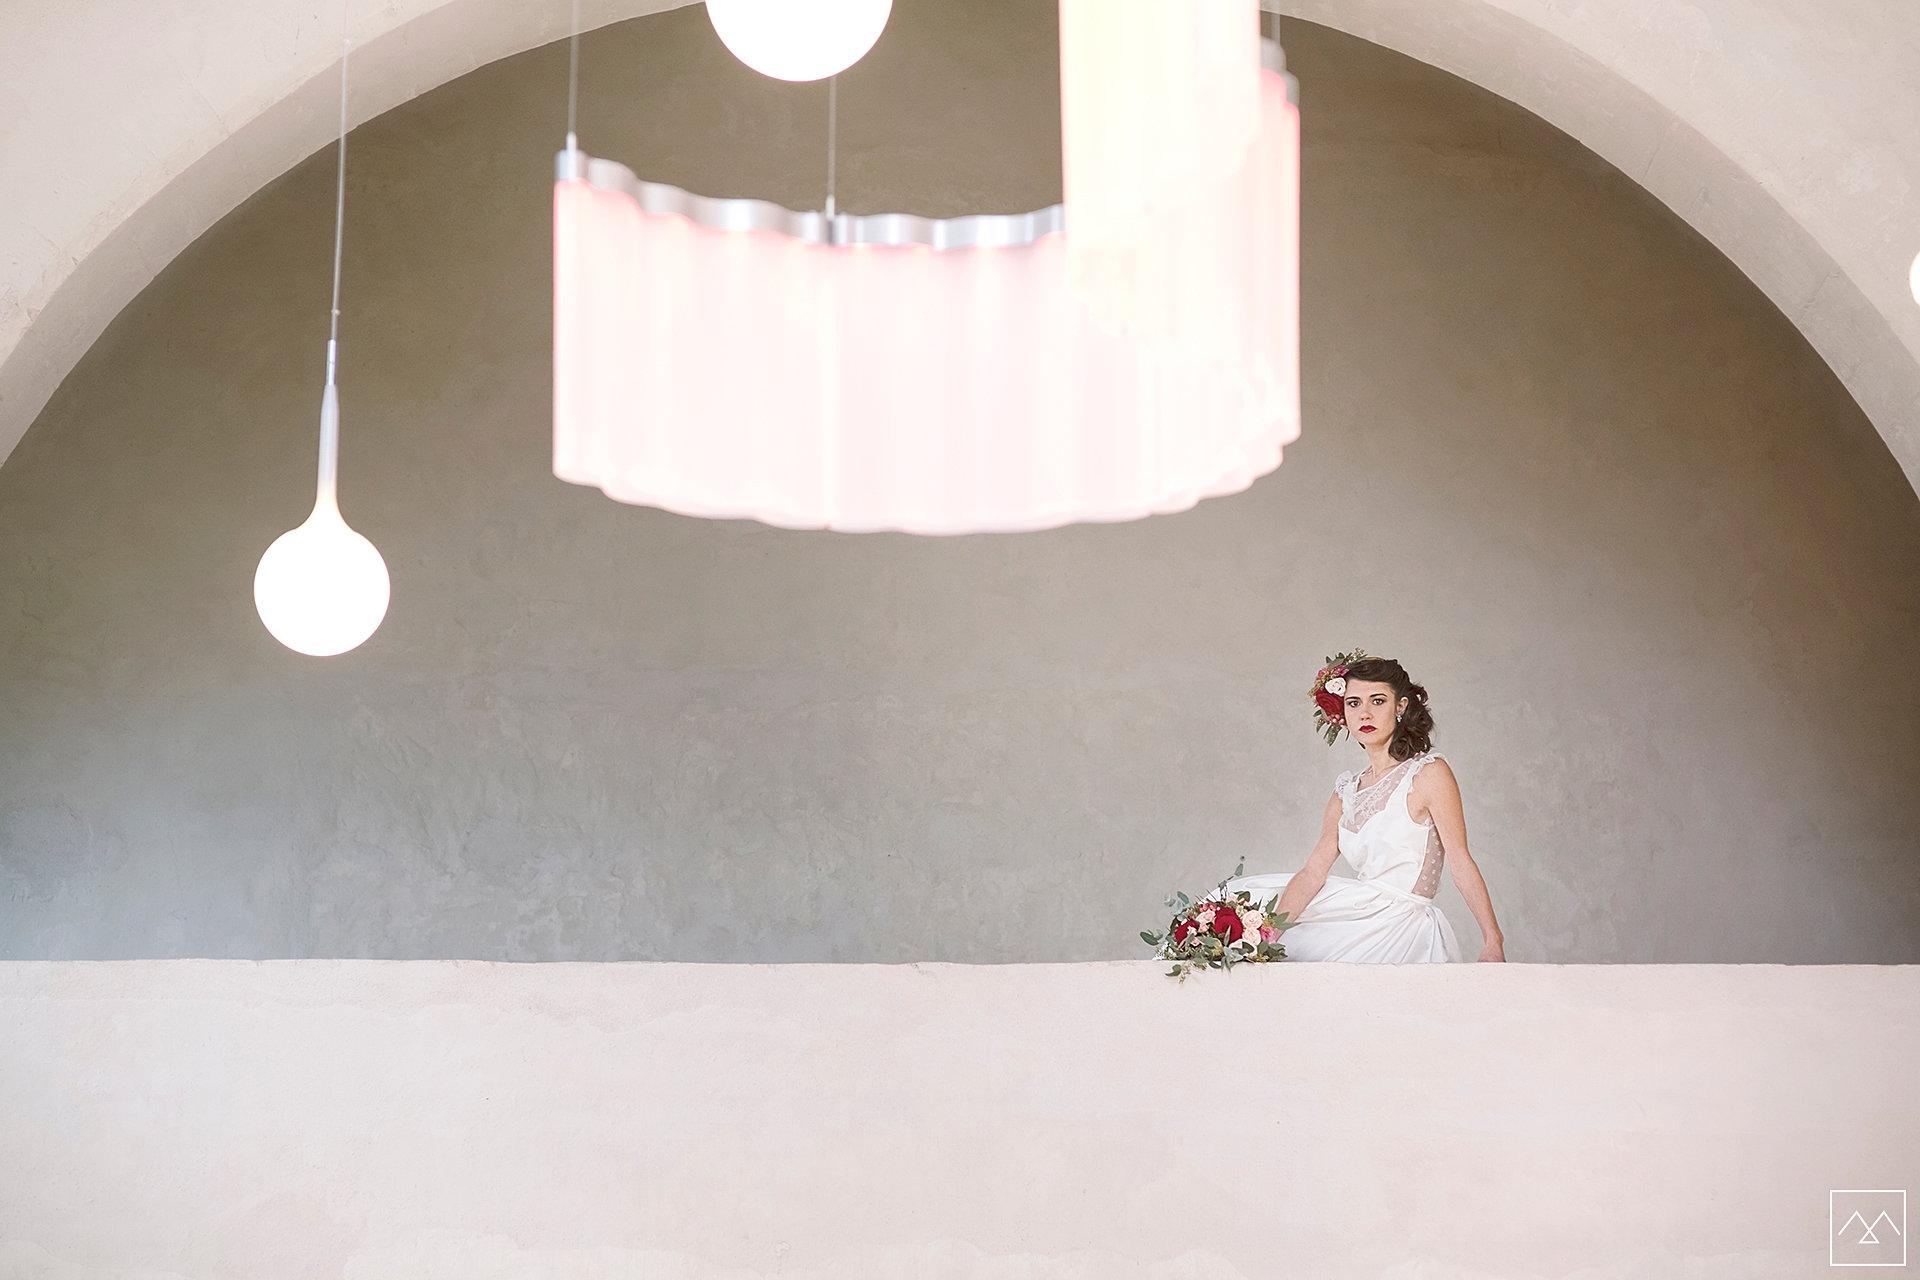 maquillage coiffure lyon 5 anna cruz maquillage et coiffure mariage lyon shooting inspiration collection 2017 - Coiffeuse Maquilleuse Mariage Lyon